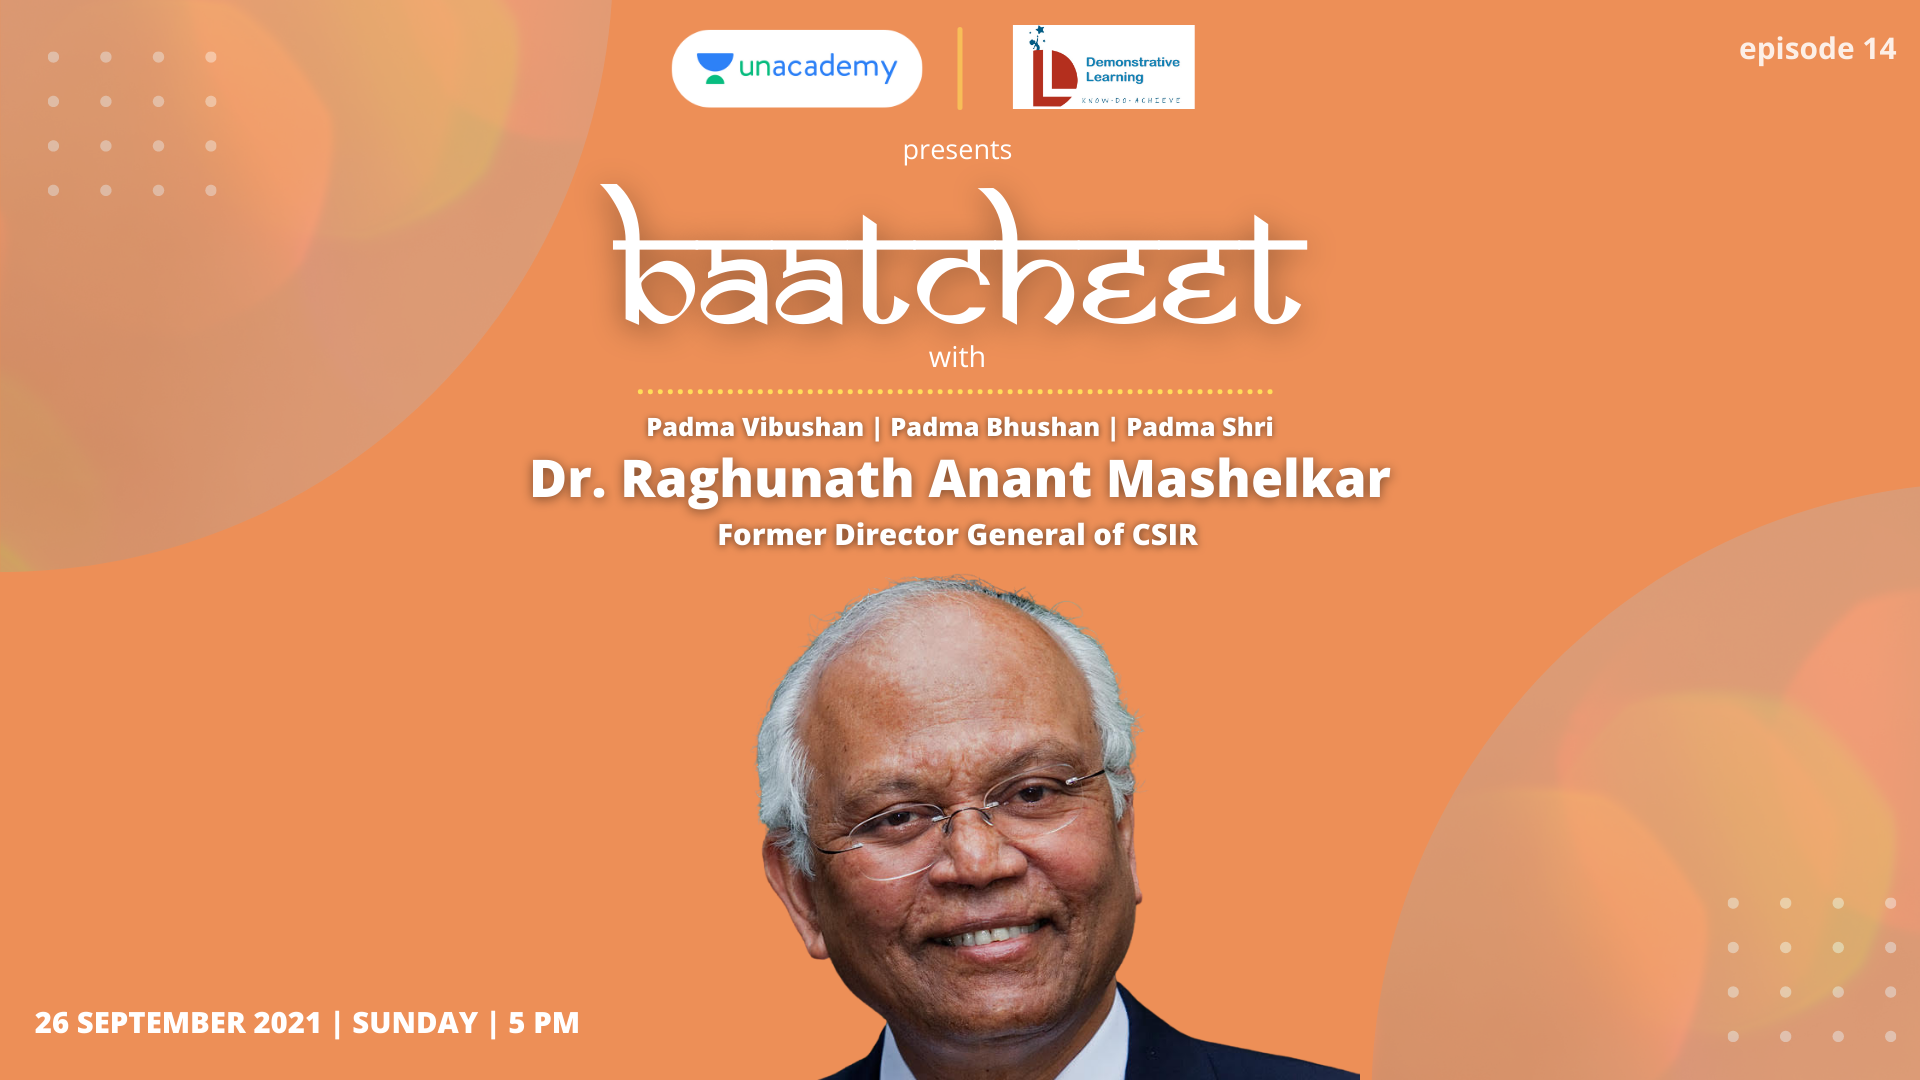 Baatcheet 14 with R.A. Mashelkar